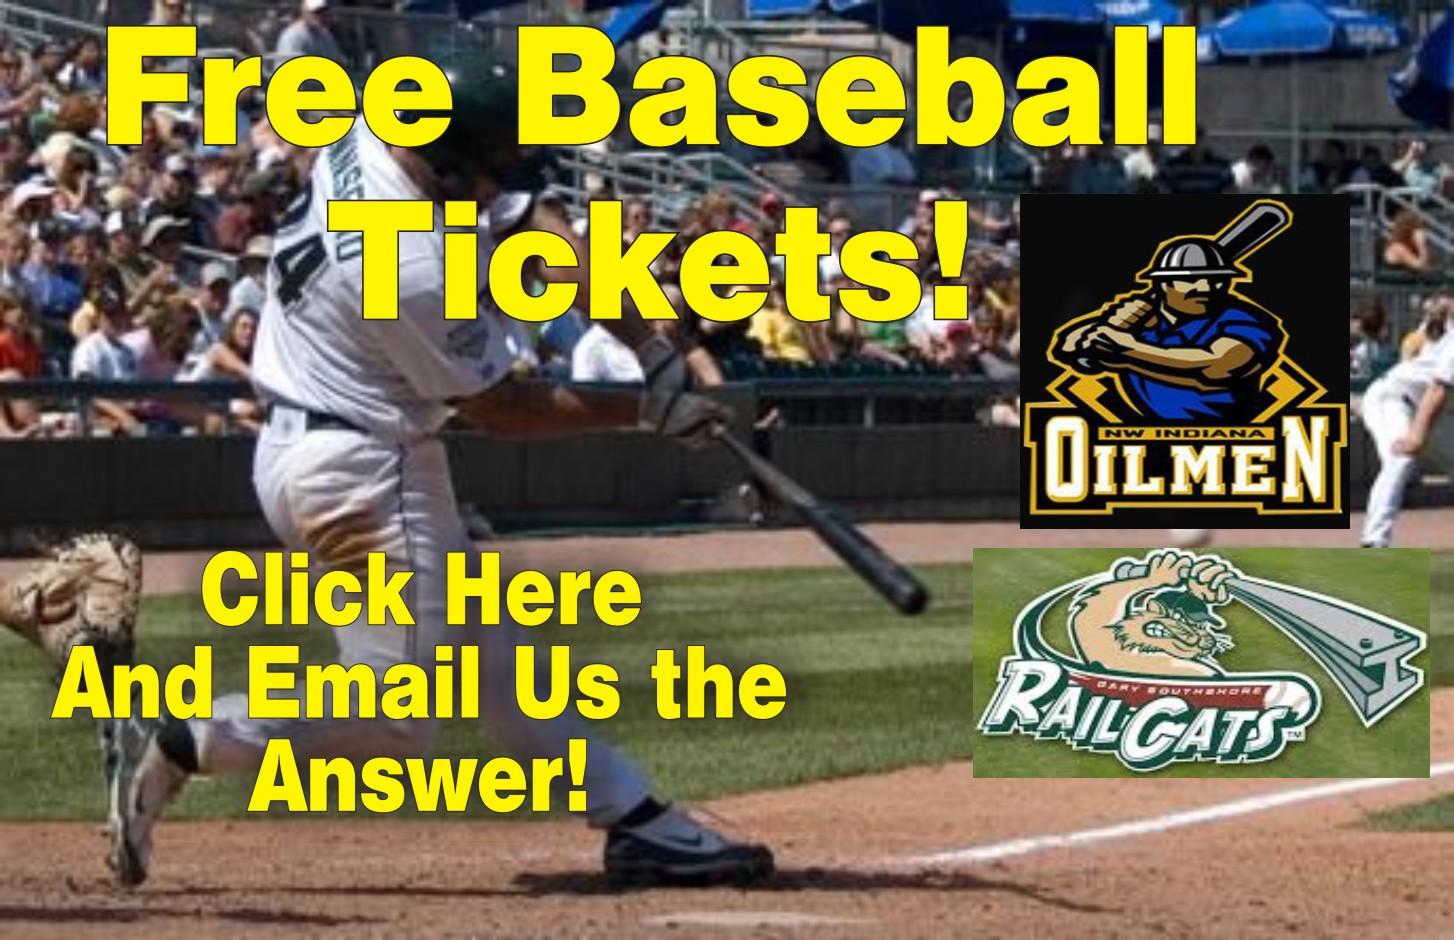 win free baseball tickets railcats oilmen